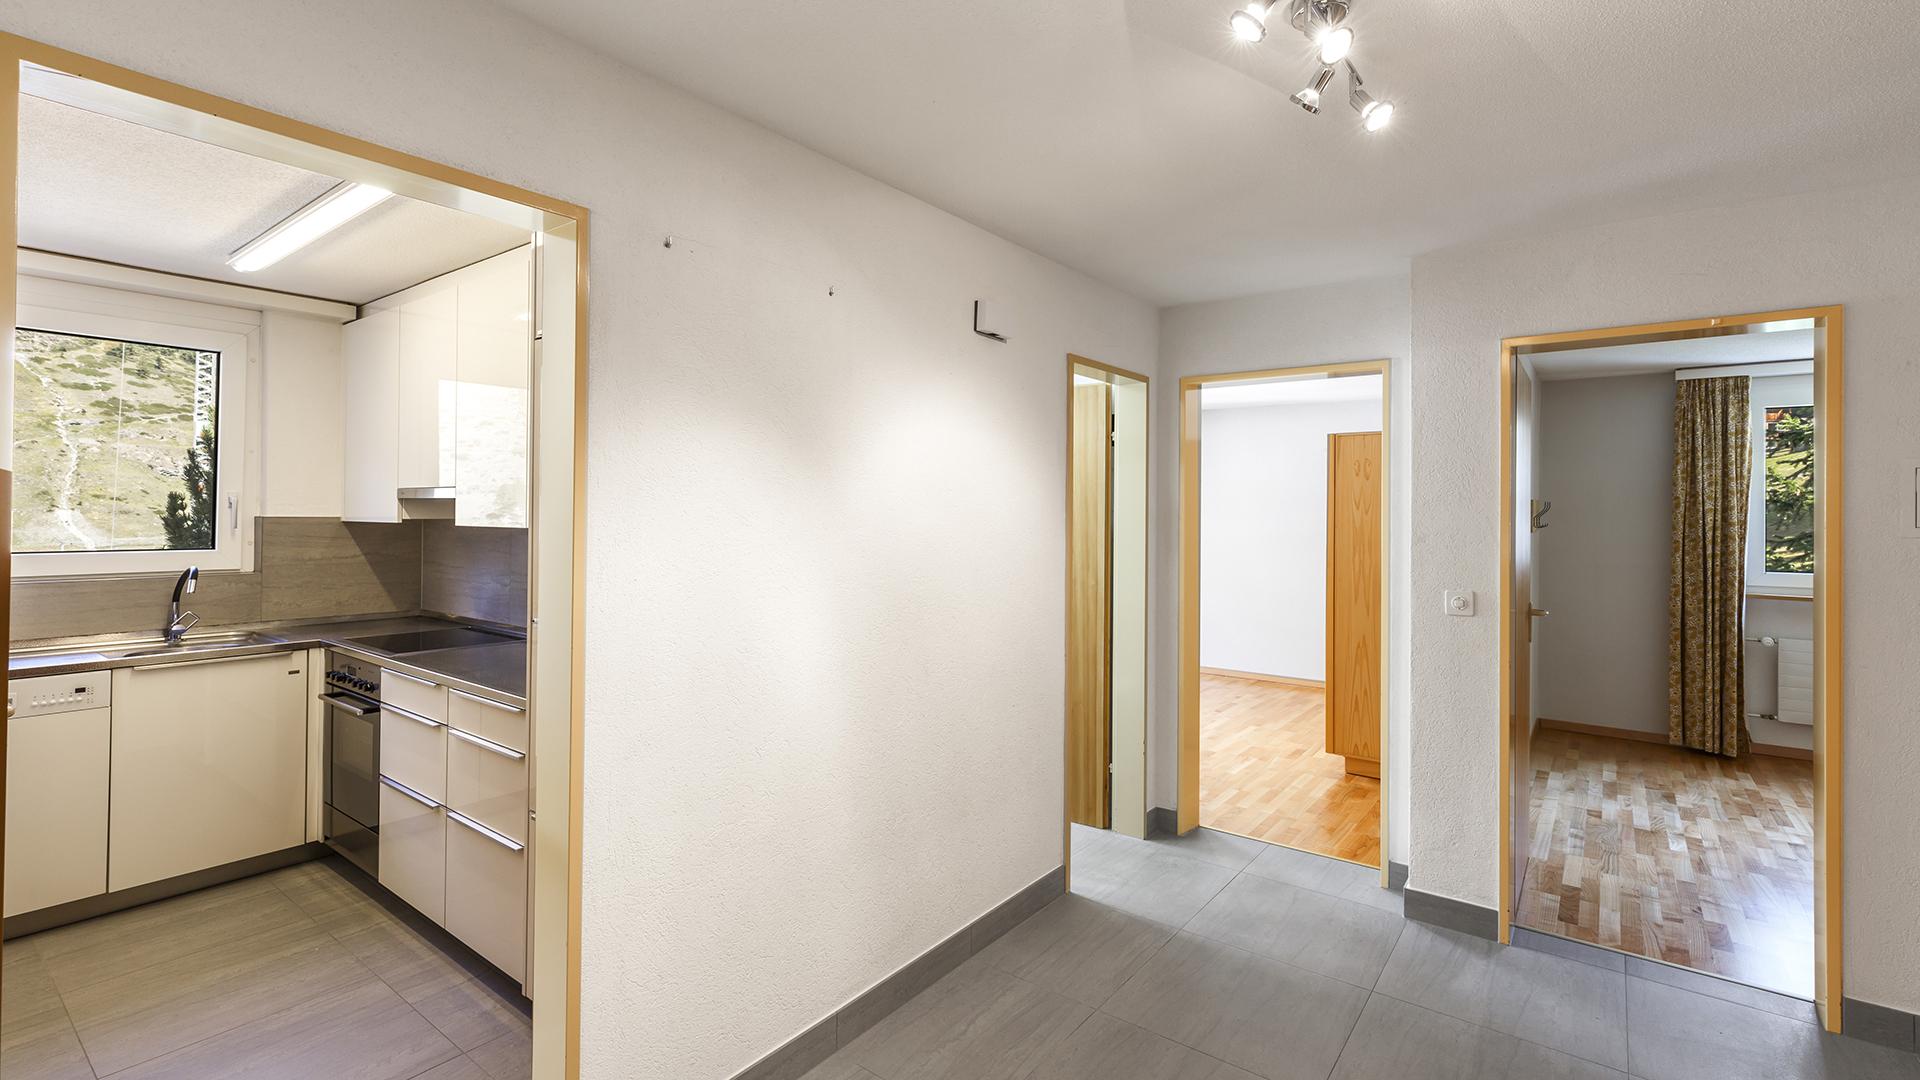 Grillon Apartments, Switzerland